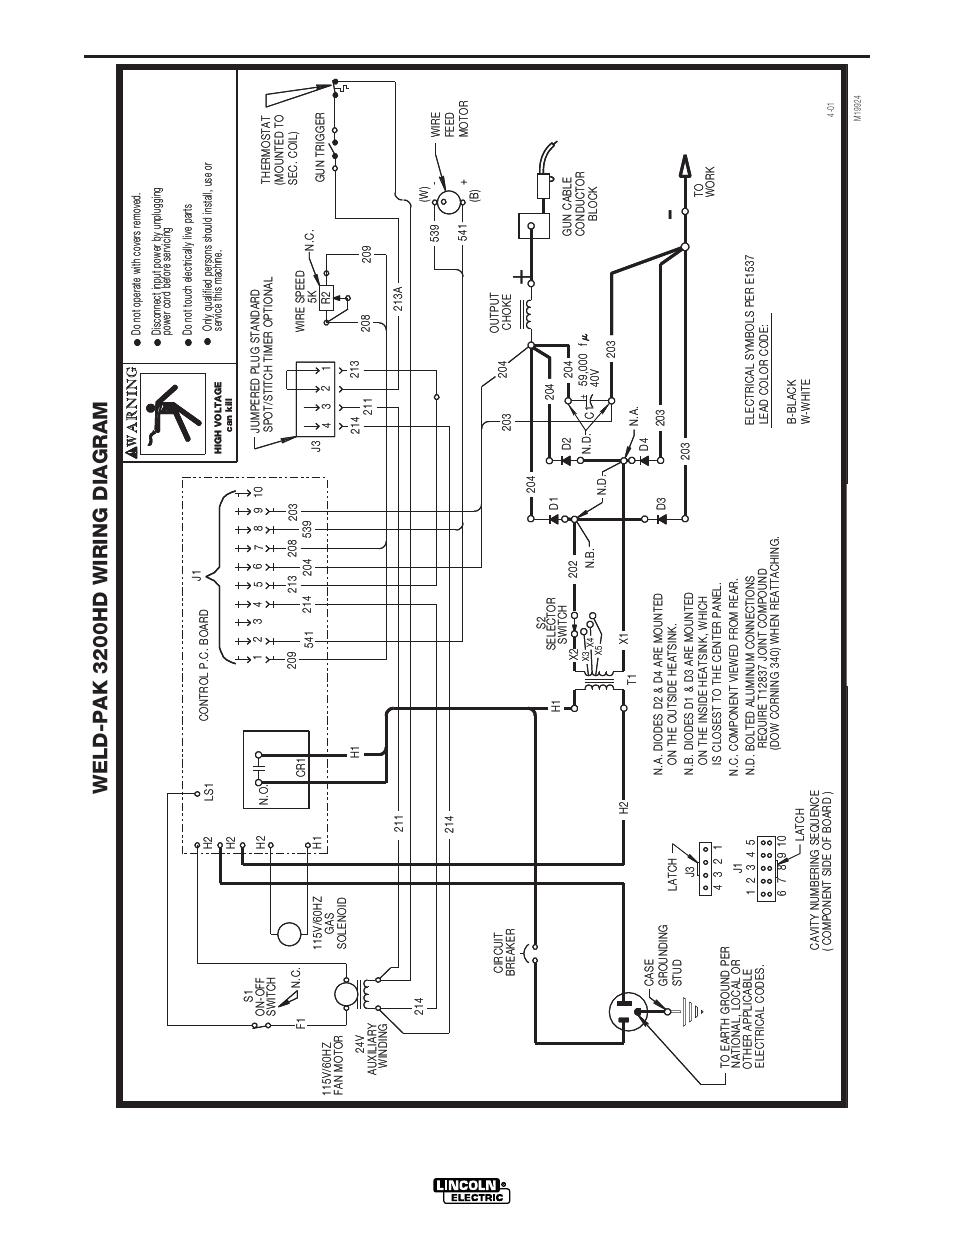 Case 85xt Wiring Diagram Manual Wire Diagrams 95xt Schematic Parking Brake